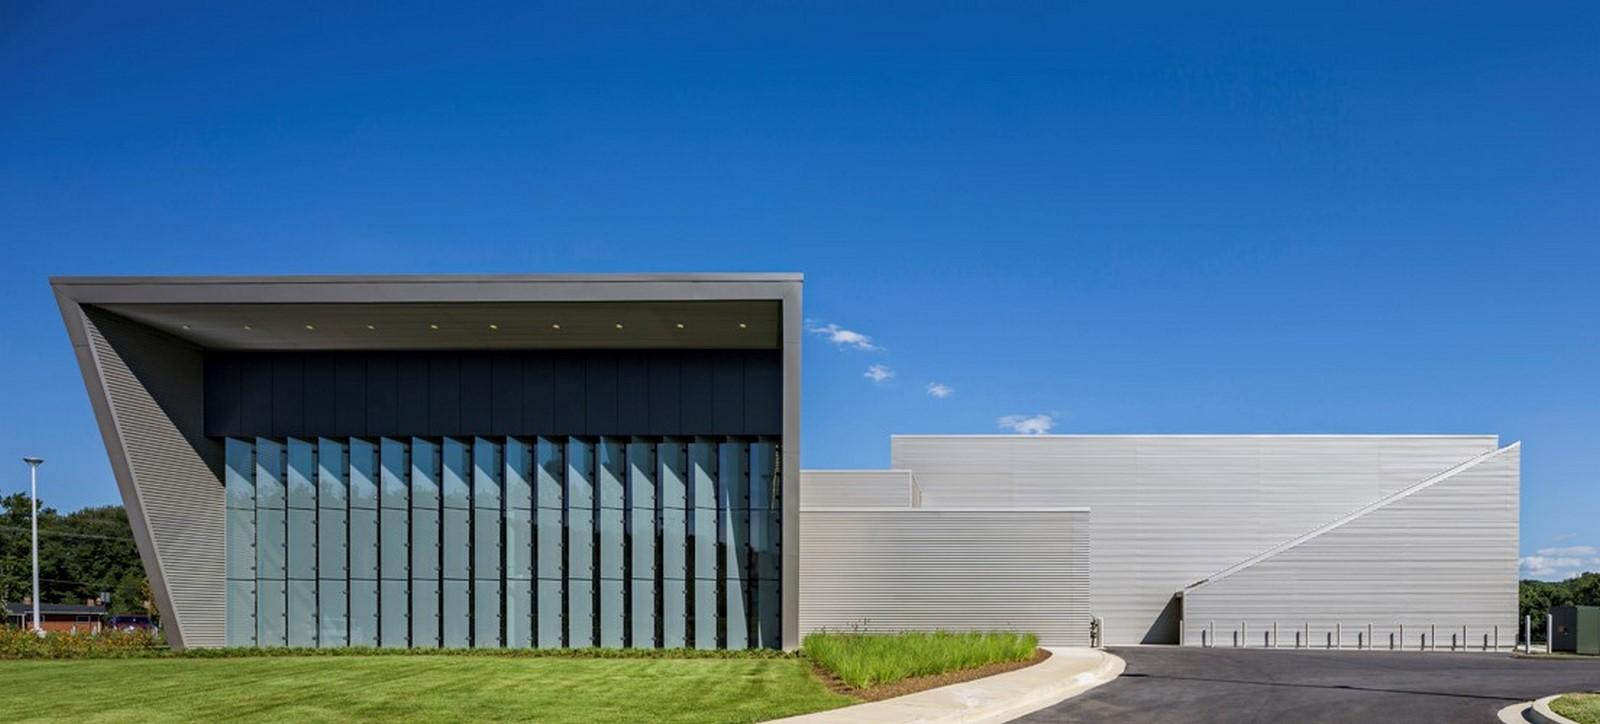 Sorg Architects- 10 Iconic Sustainable Projects - Sheet8